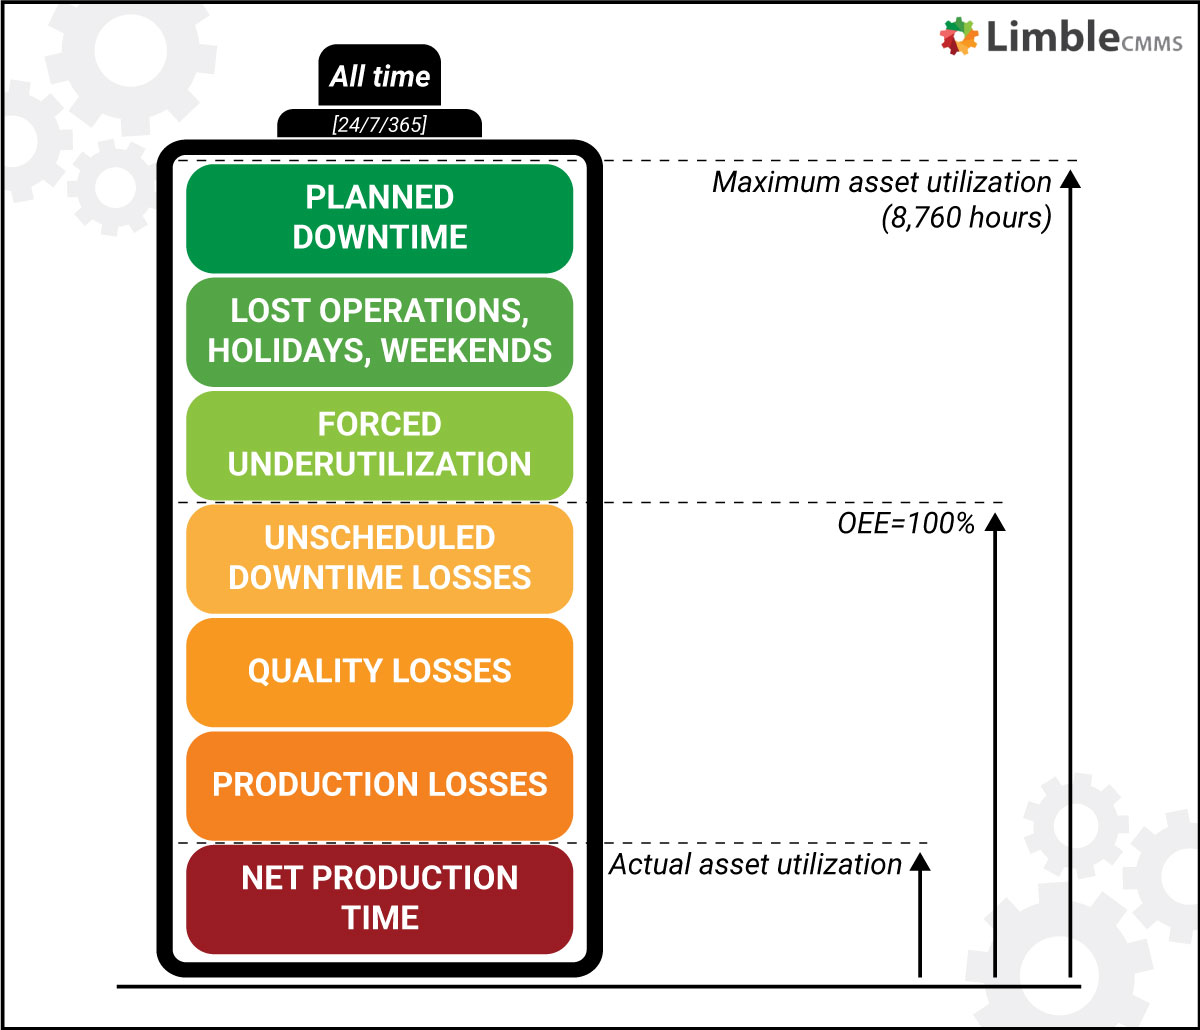 measuring asset utilization